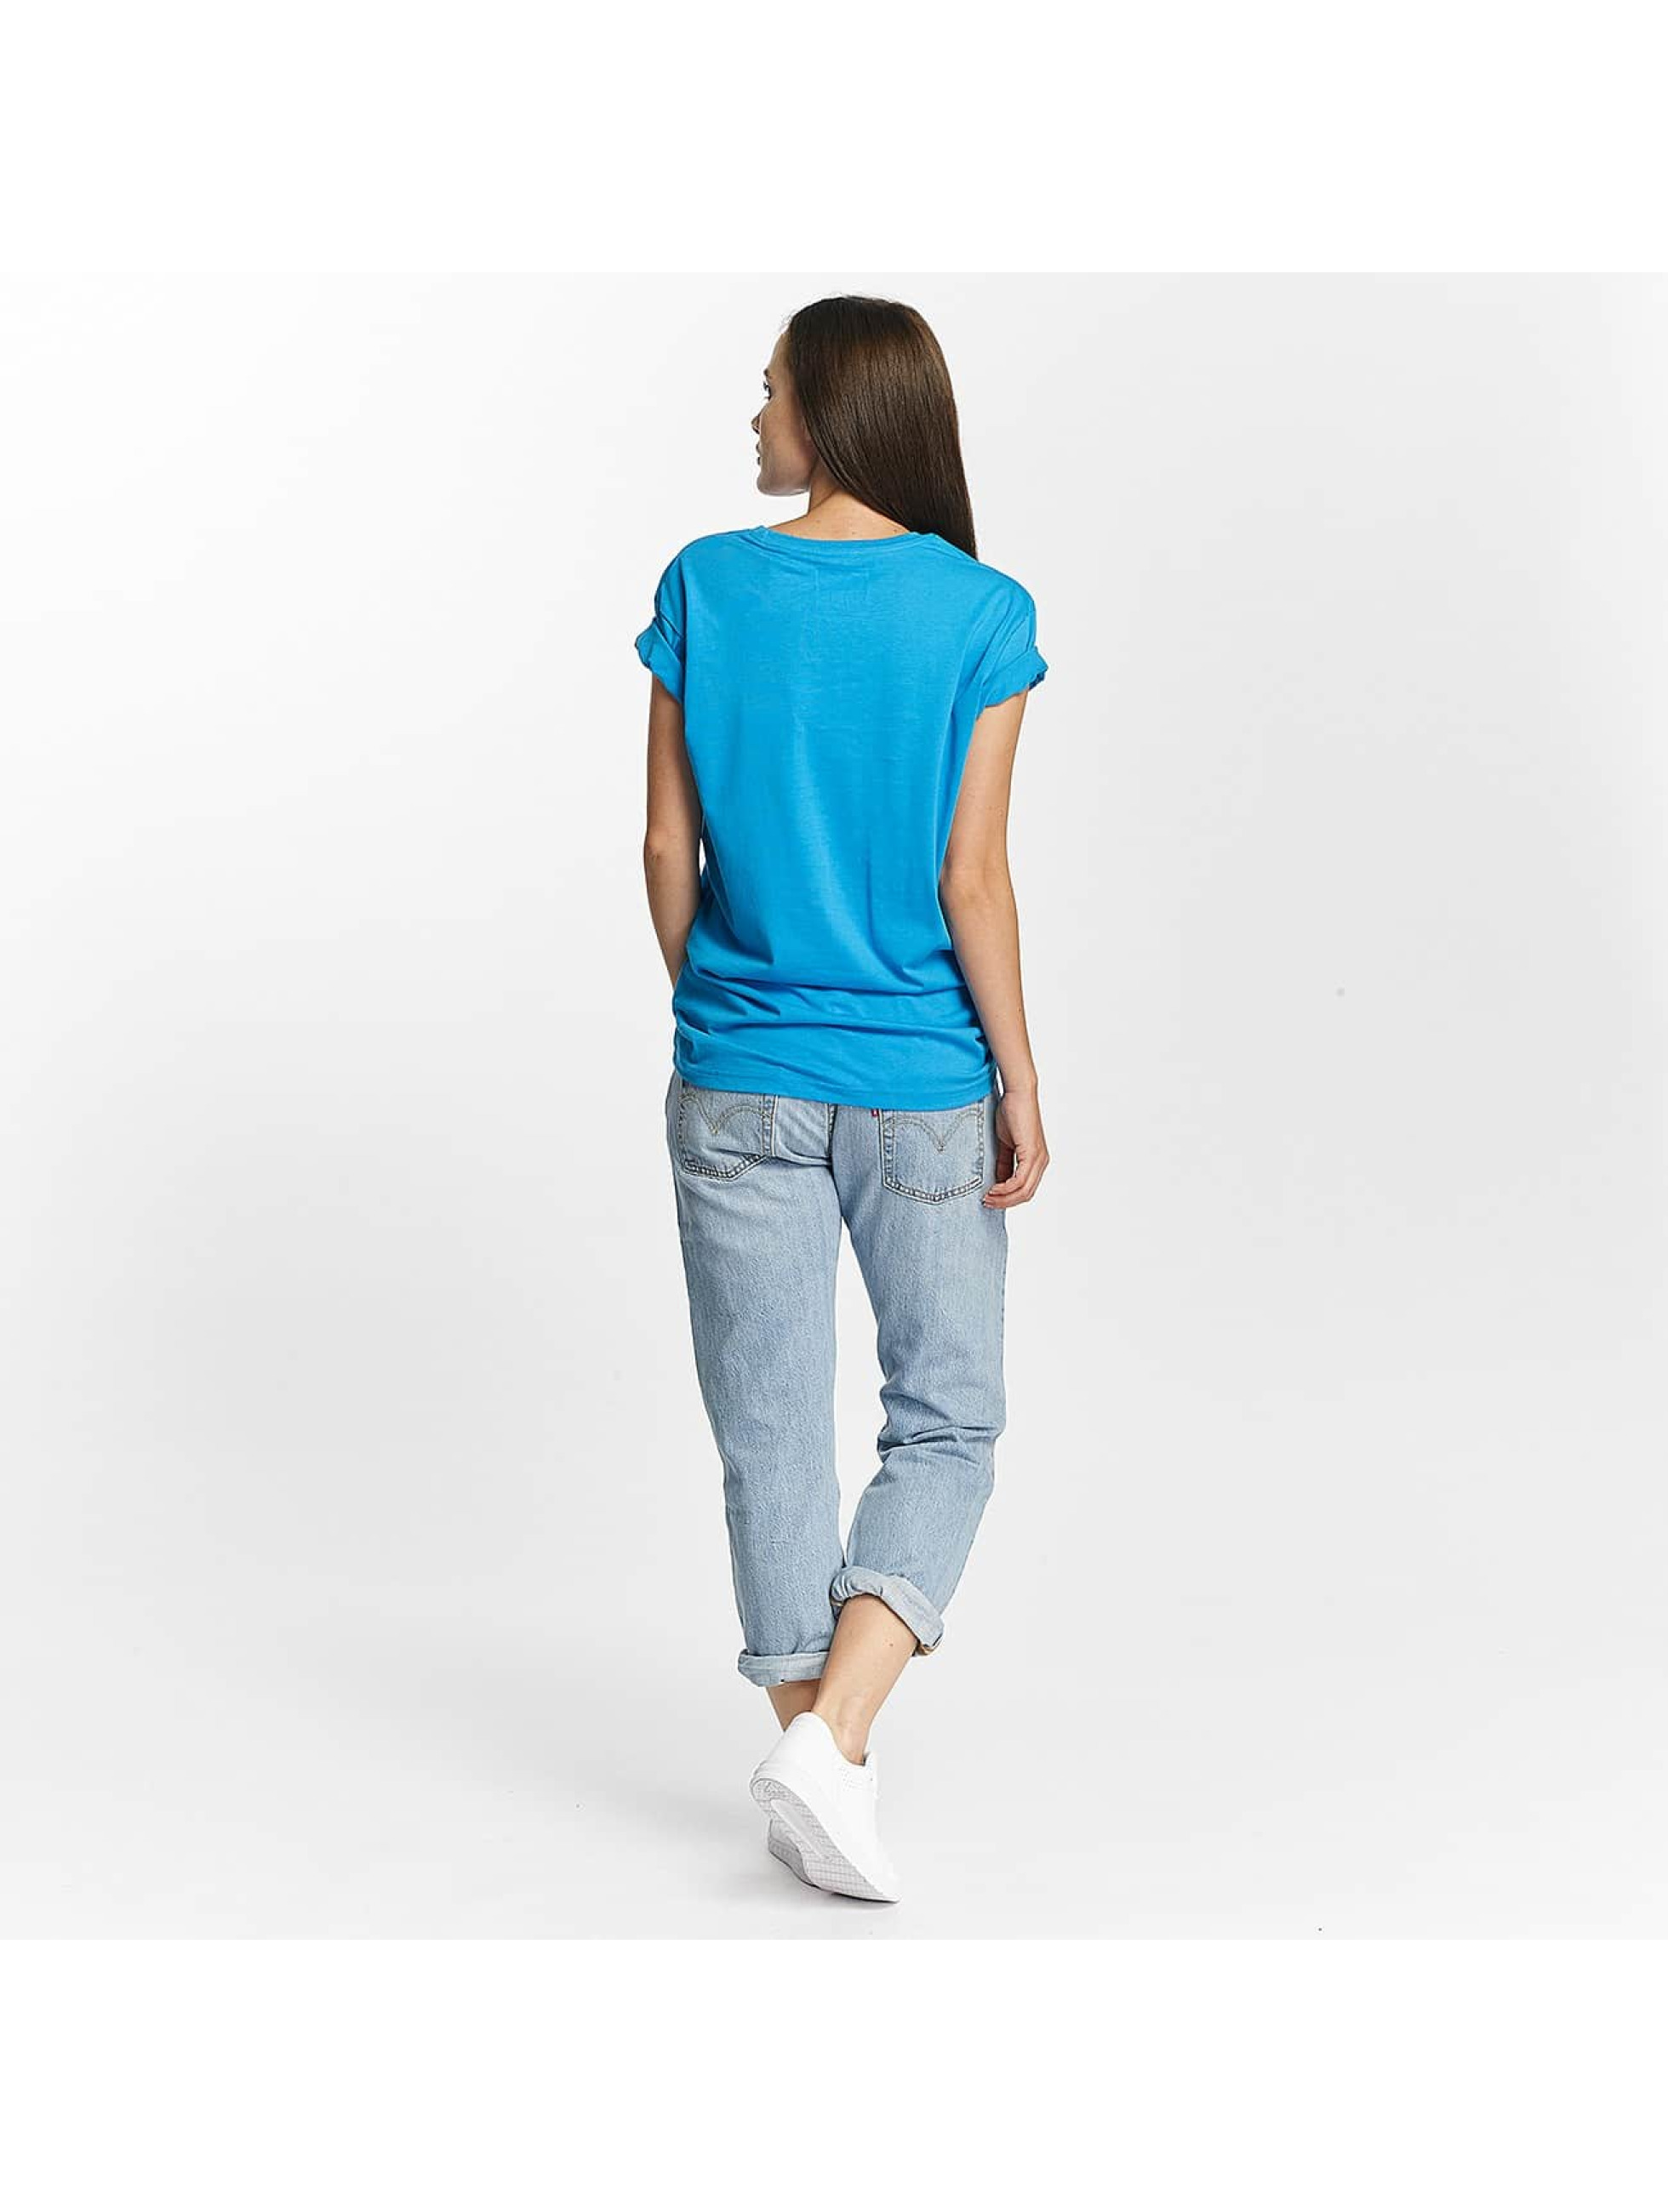 Cyprime T-skjorter Cerium Oversized turkis